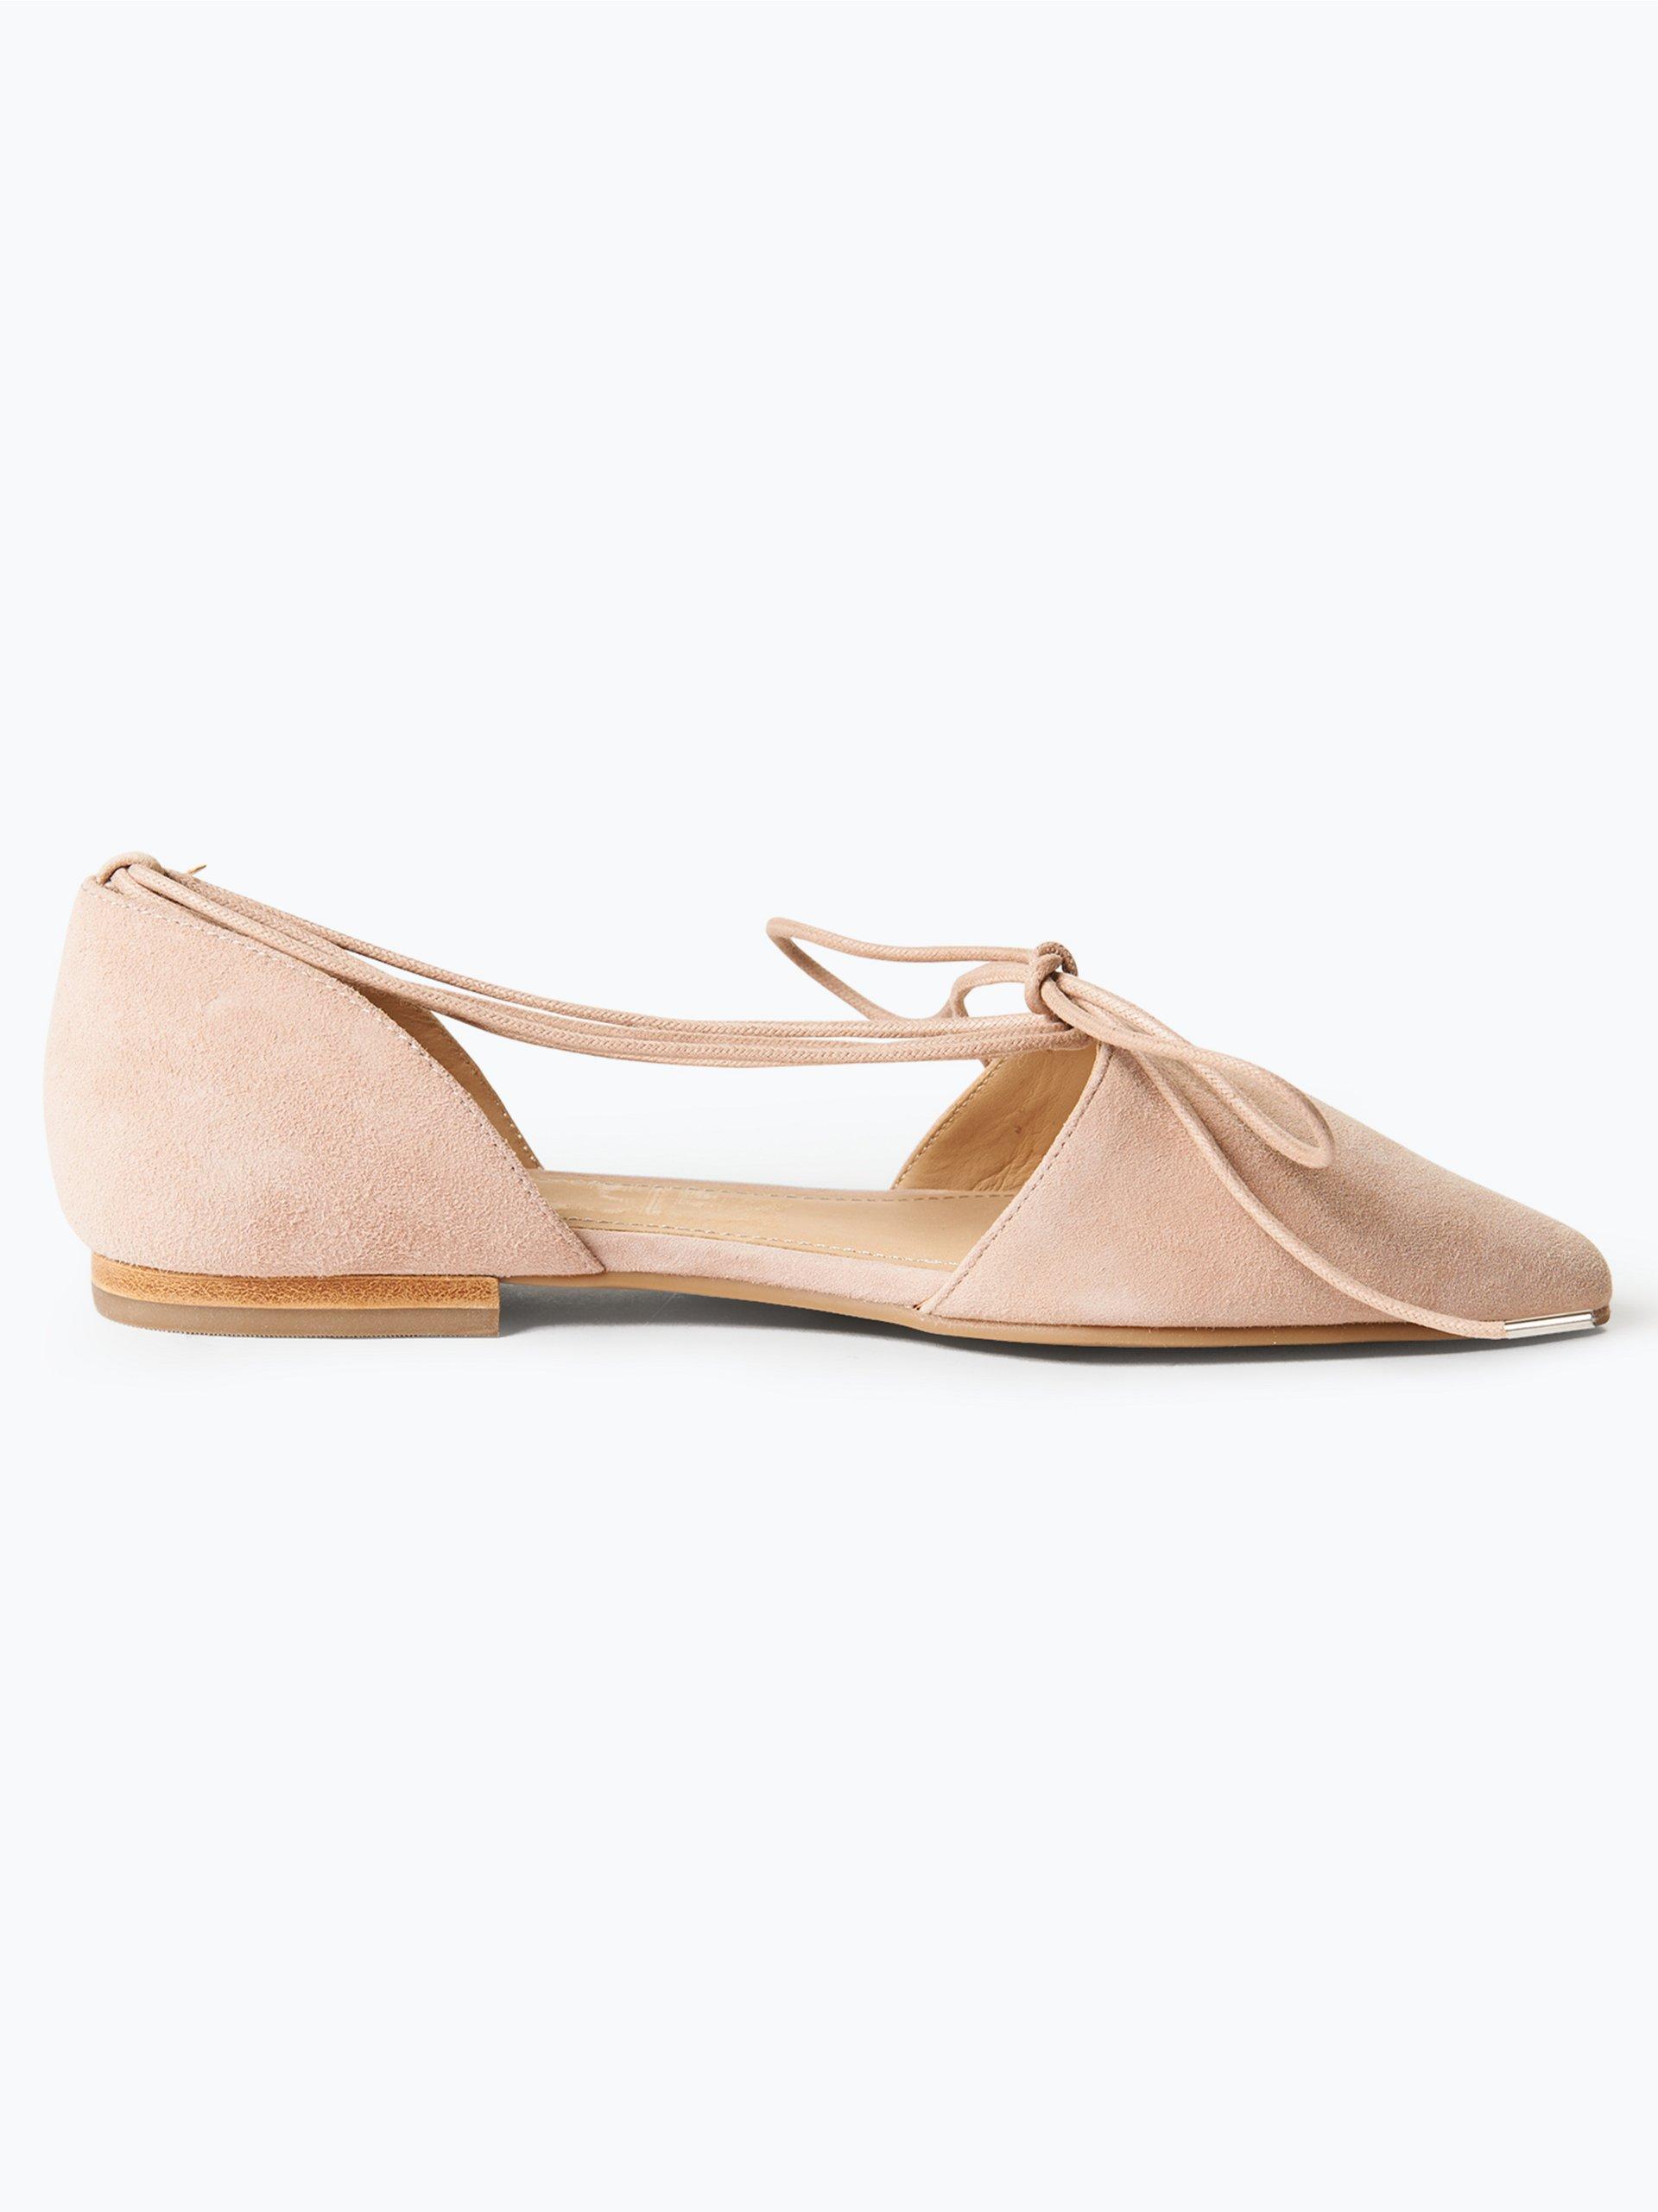 6a5c4bb1ec2dbd Marc O'Polo Damen Ballerinas aus Leder online kaufen | VANGRAAF.COM